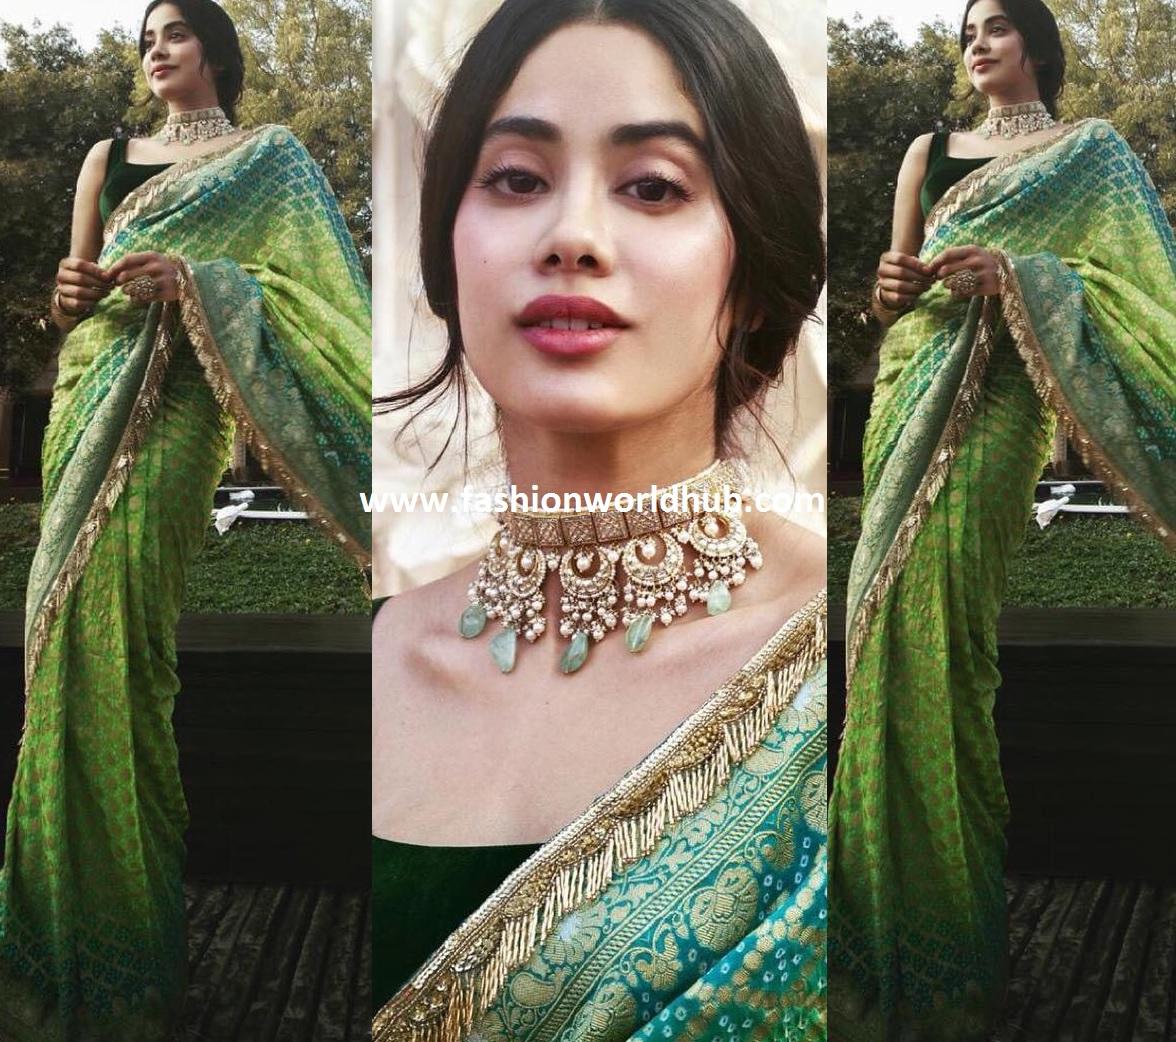 Janhvi Kapoor In Manish Malhotra Saree Fashionworldhub